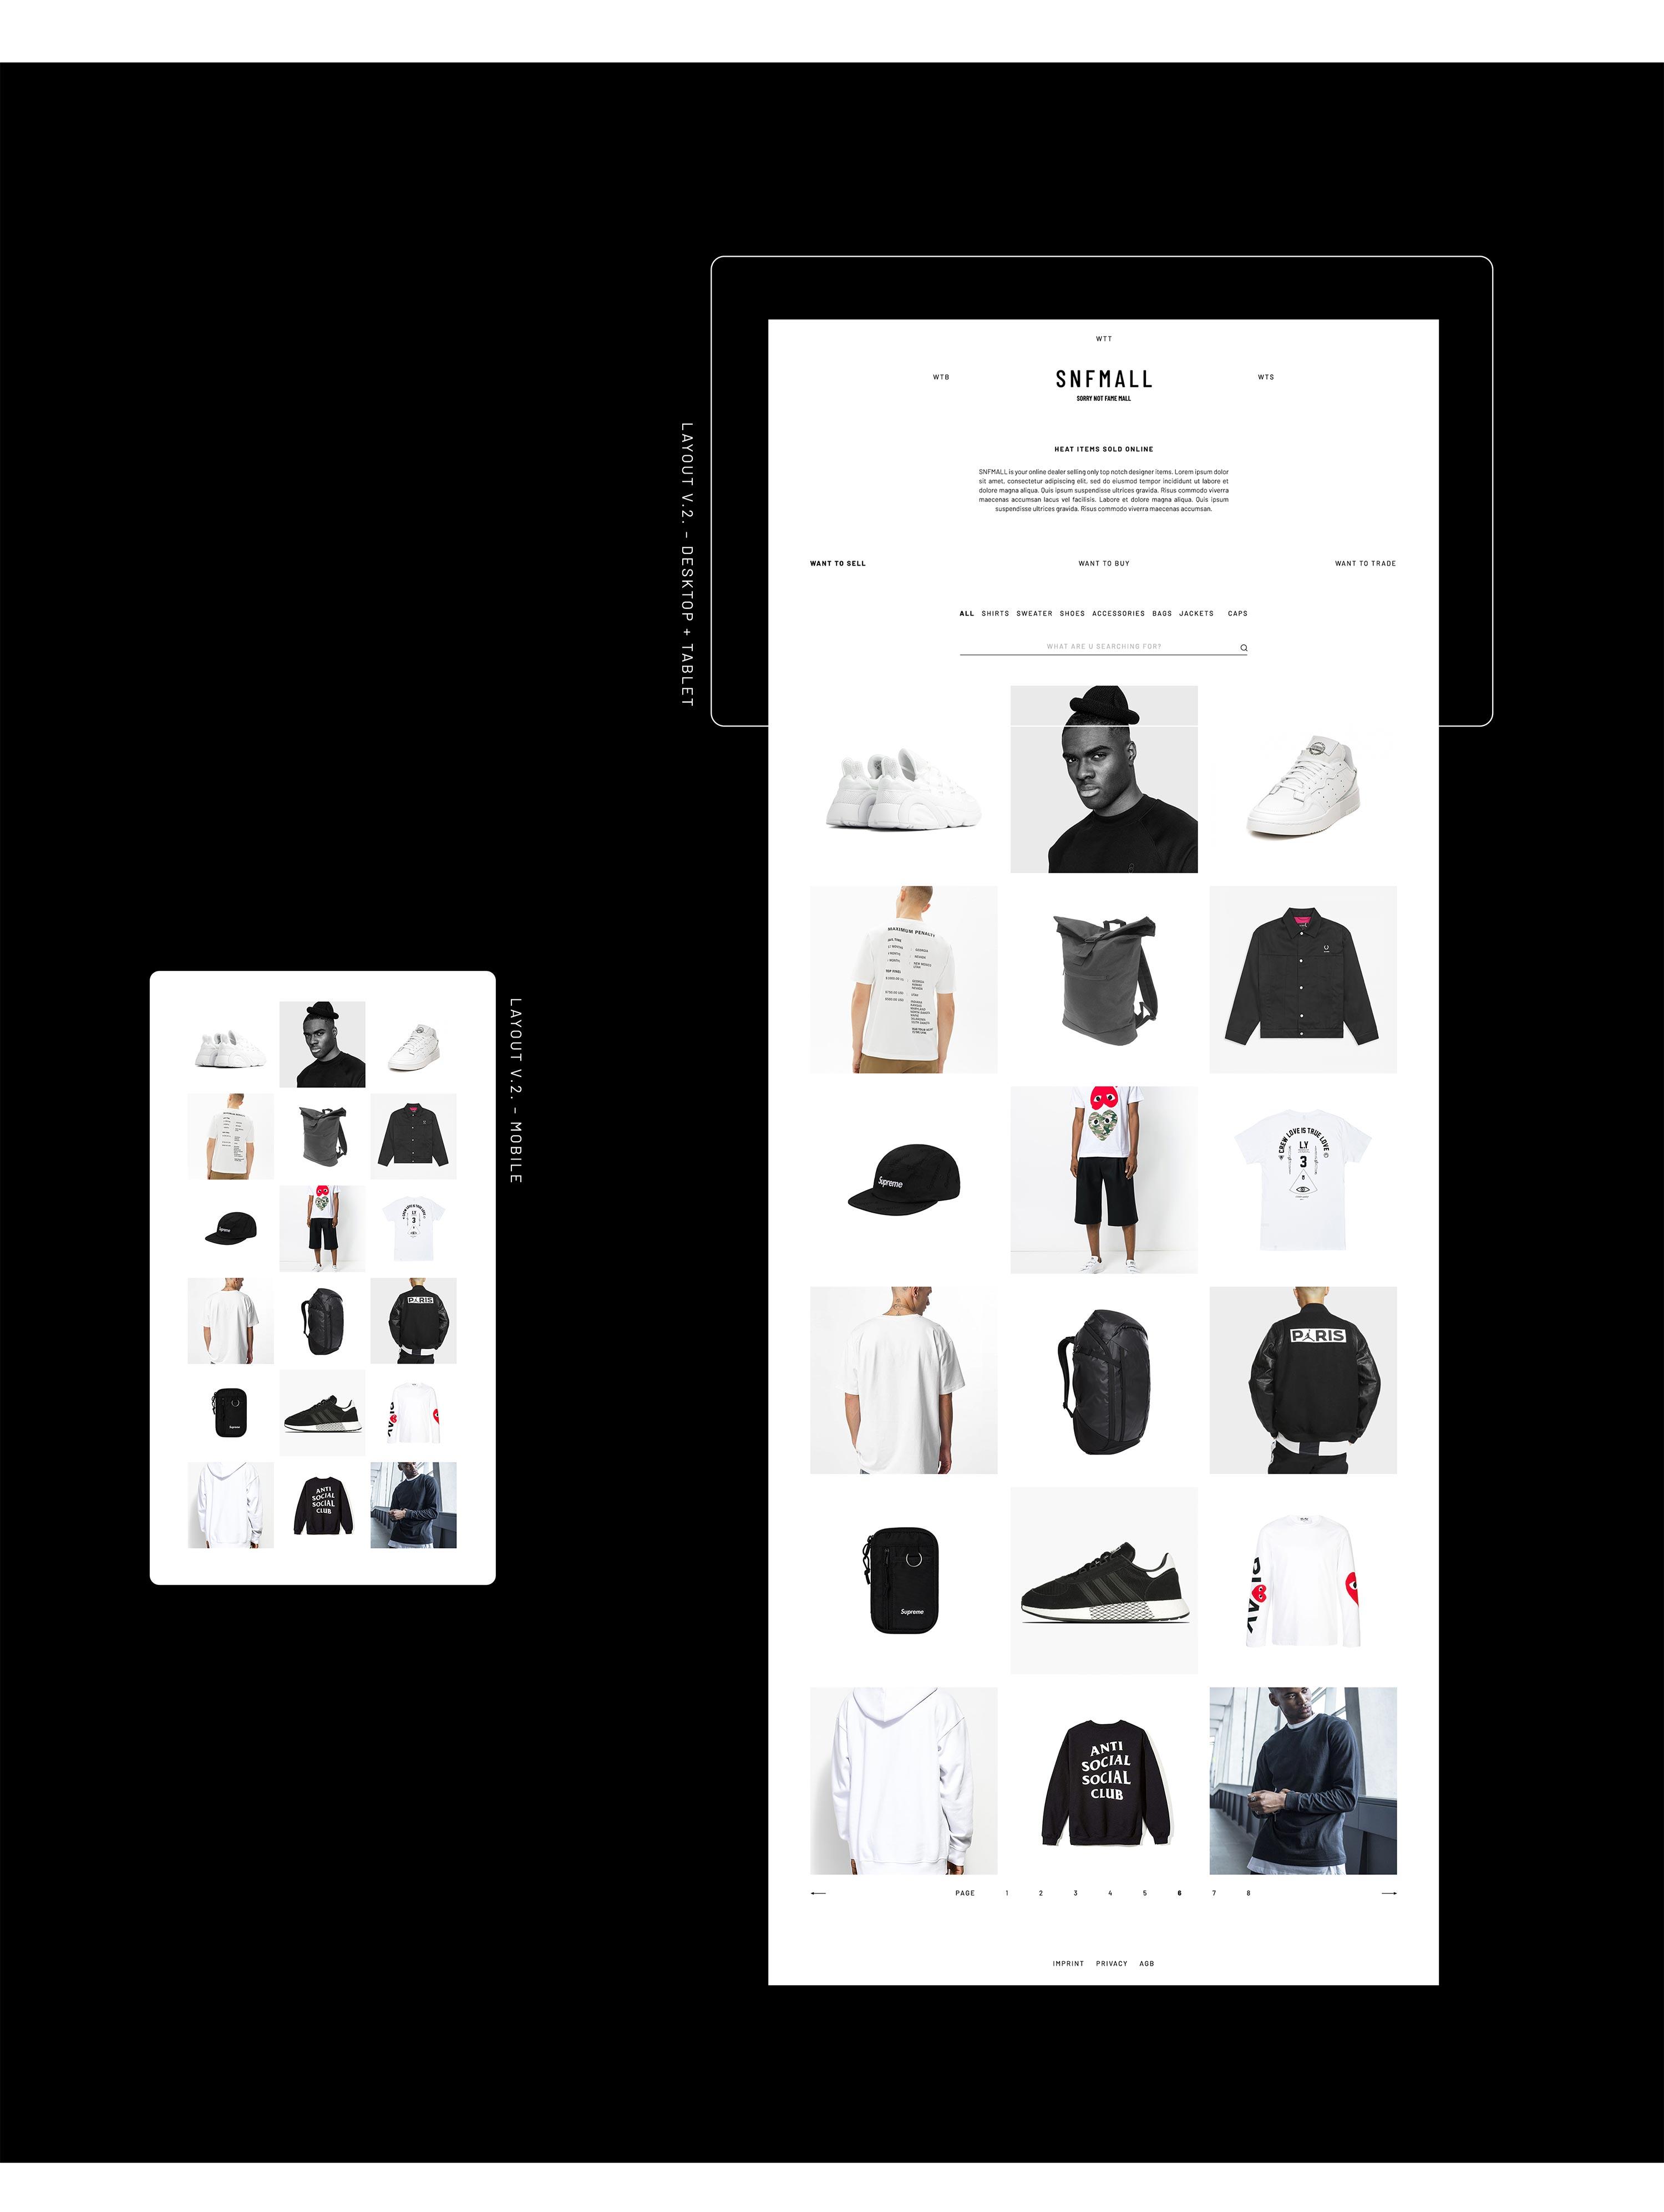 07-blockundstift-snf-mall-sorry-not-fame-mall-screendesign-website-design-instagram-ipad-mobile